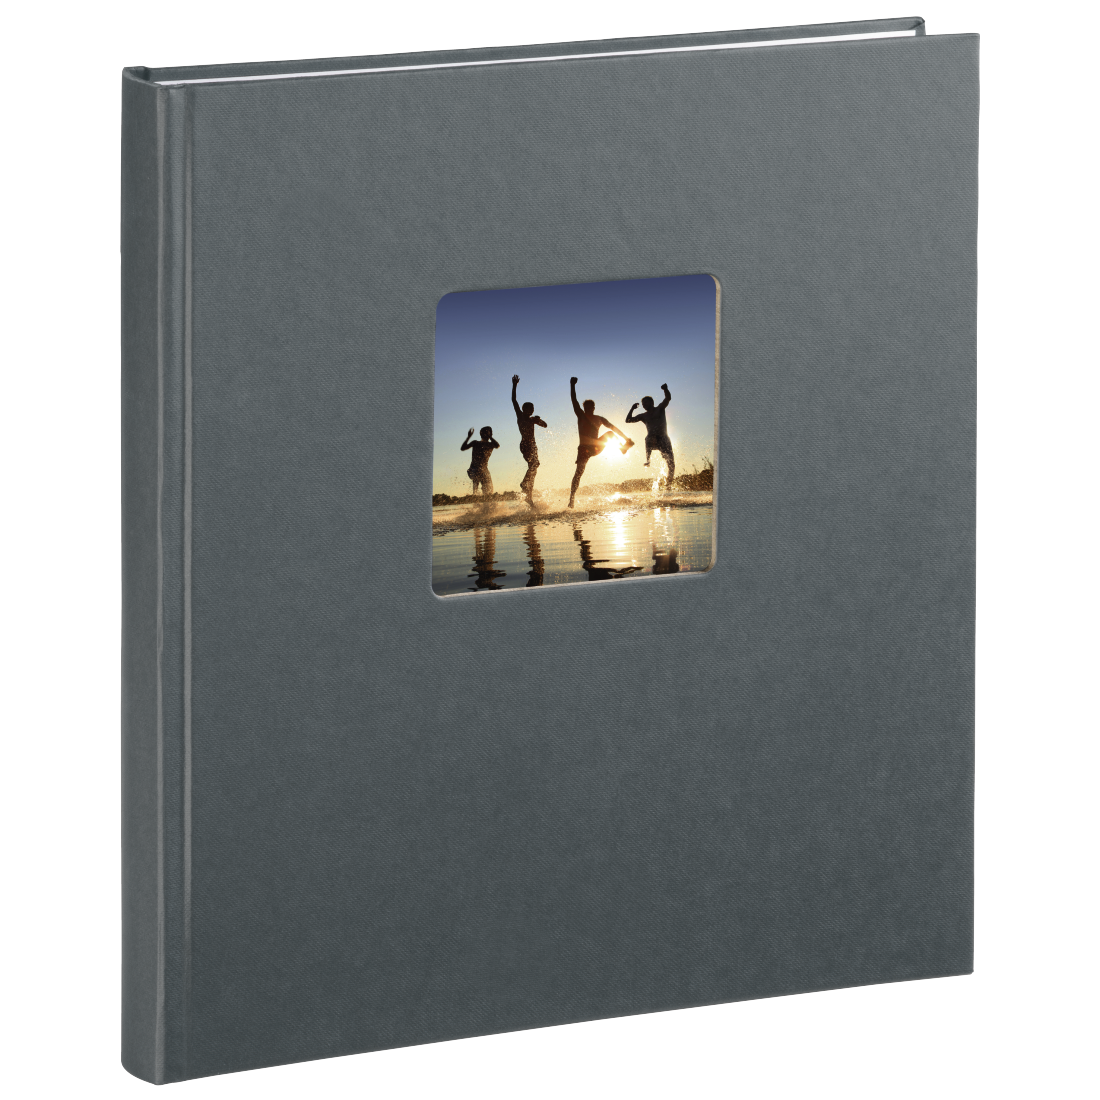 00002117 hama buch album fine art 29 x 32 cm 50 wei e seiten grau hama. Black Bedroom Furniture Sets. Home Design Ideas